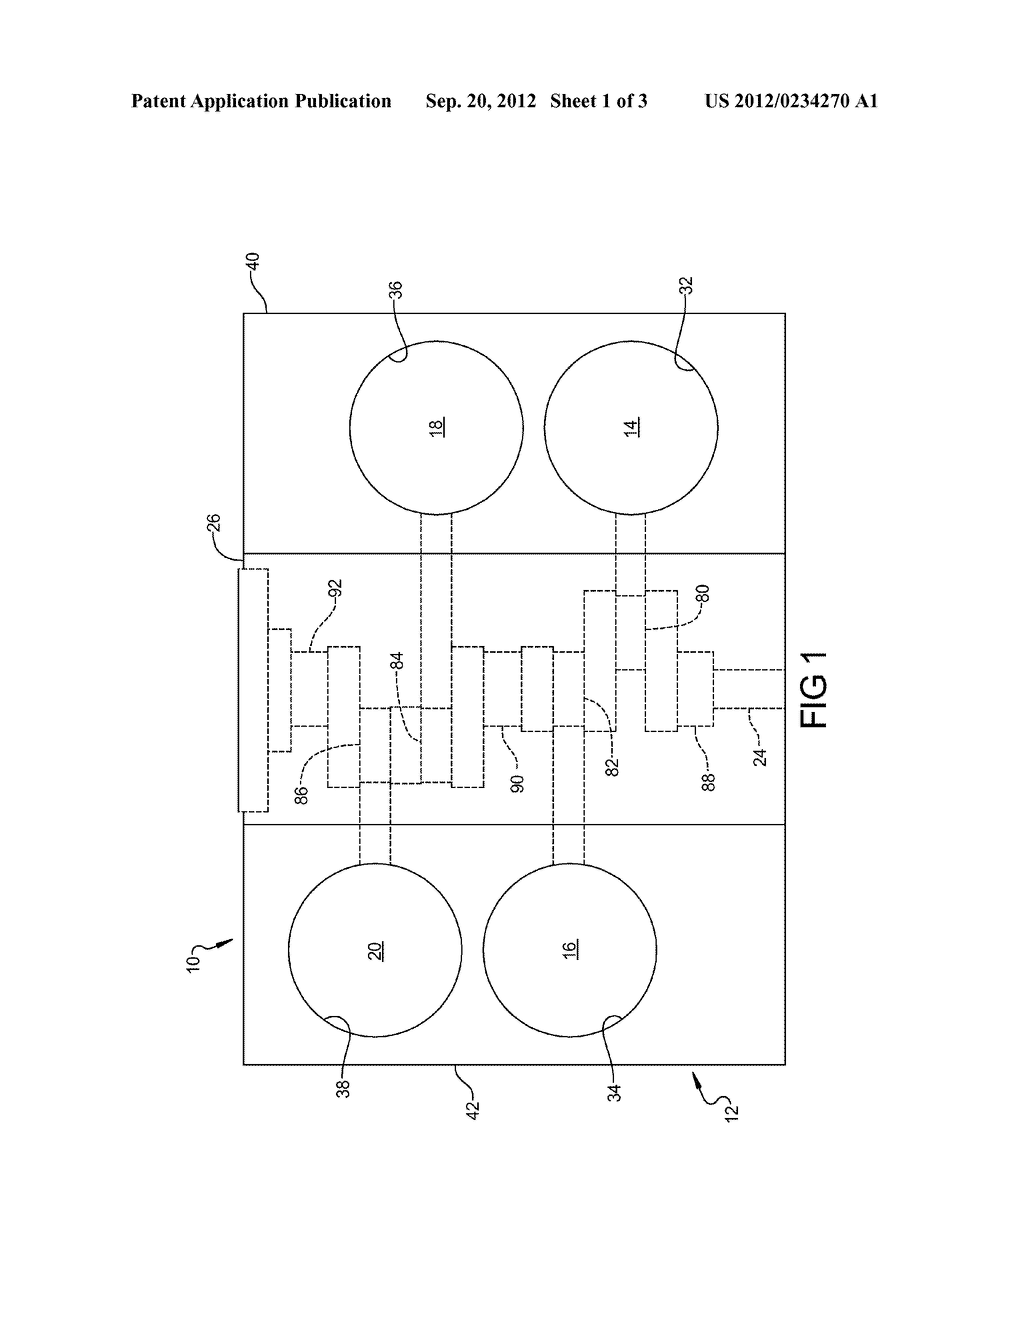 hight resolution of engine assembly including crankshaft for v4 arrangement diagram rh patentsencyclopedia com i4 engine diagram s10 engine